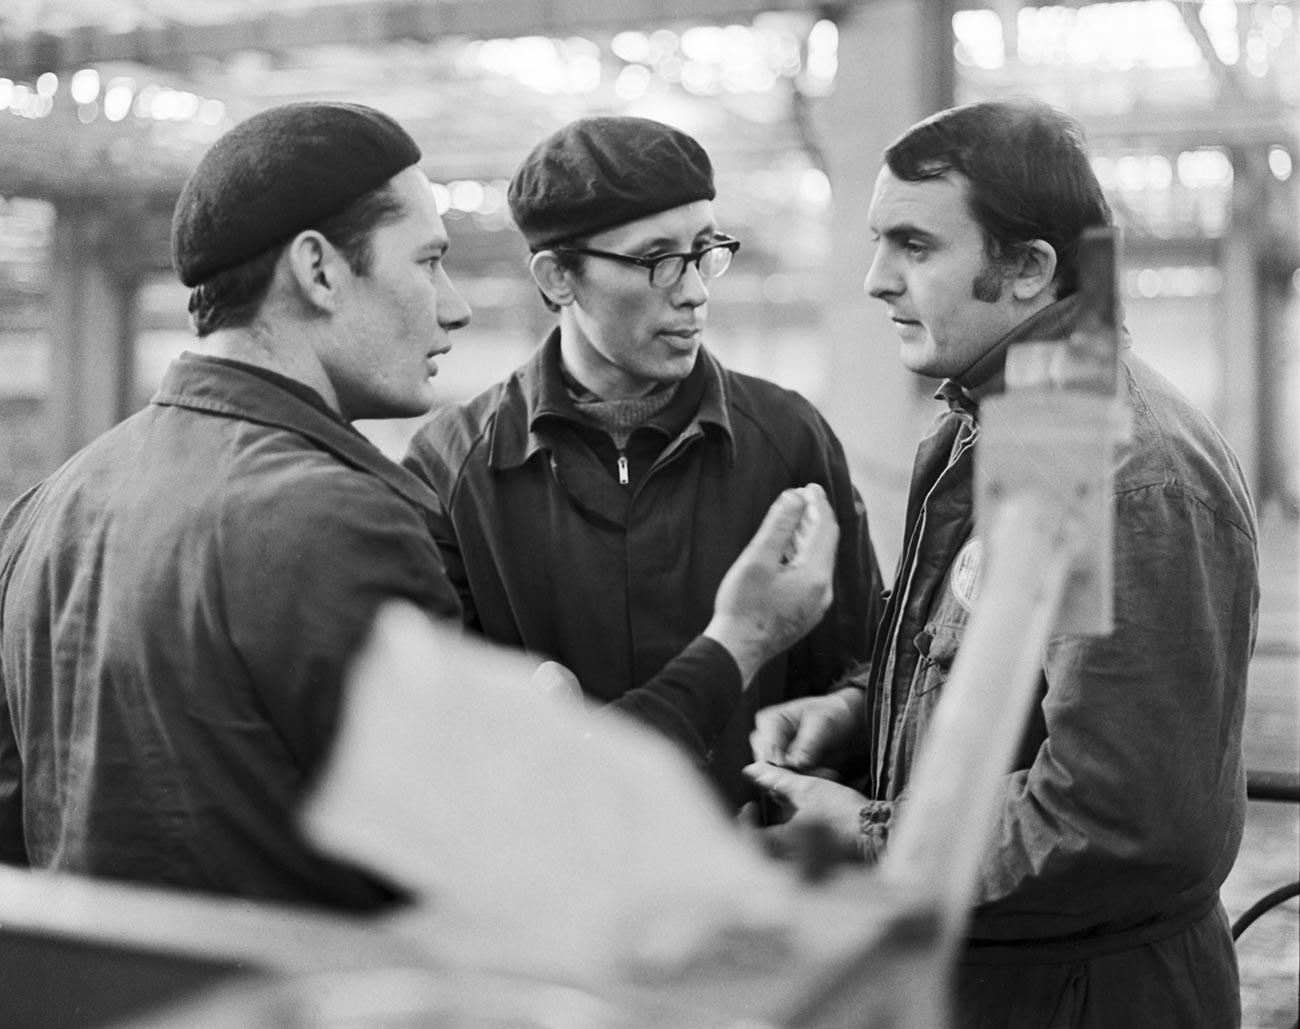 Insinyur Rusia dan Italia berdiskusi di pabrik yang baru di Tolyatti, Uni Soviet.